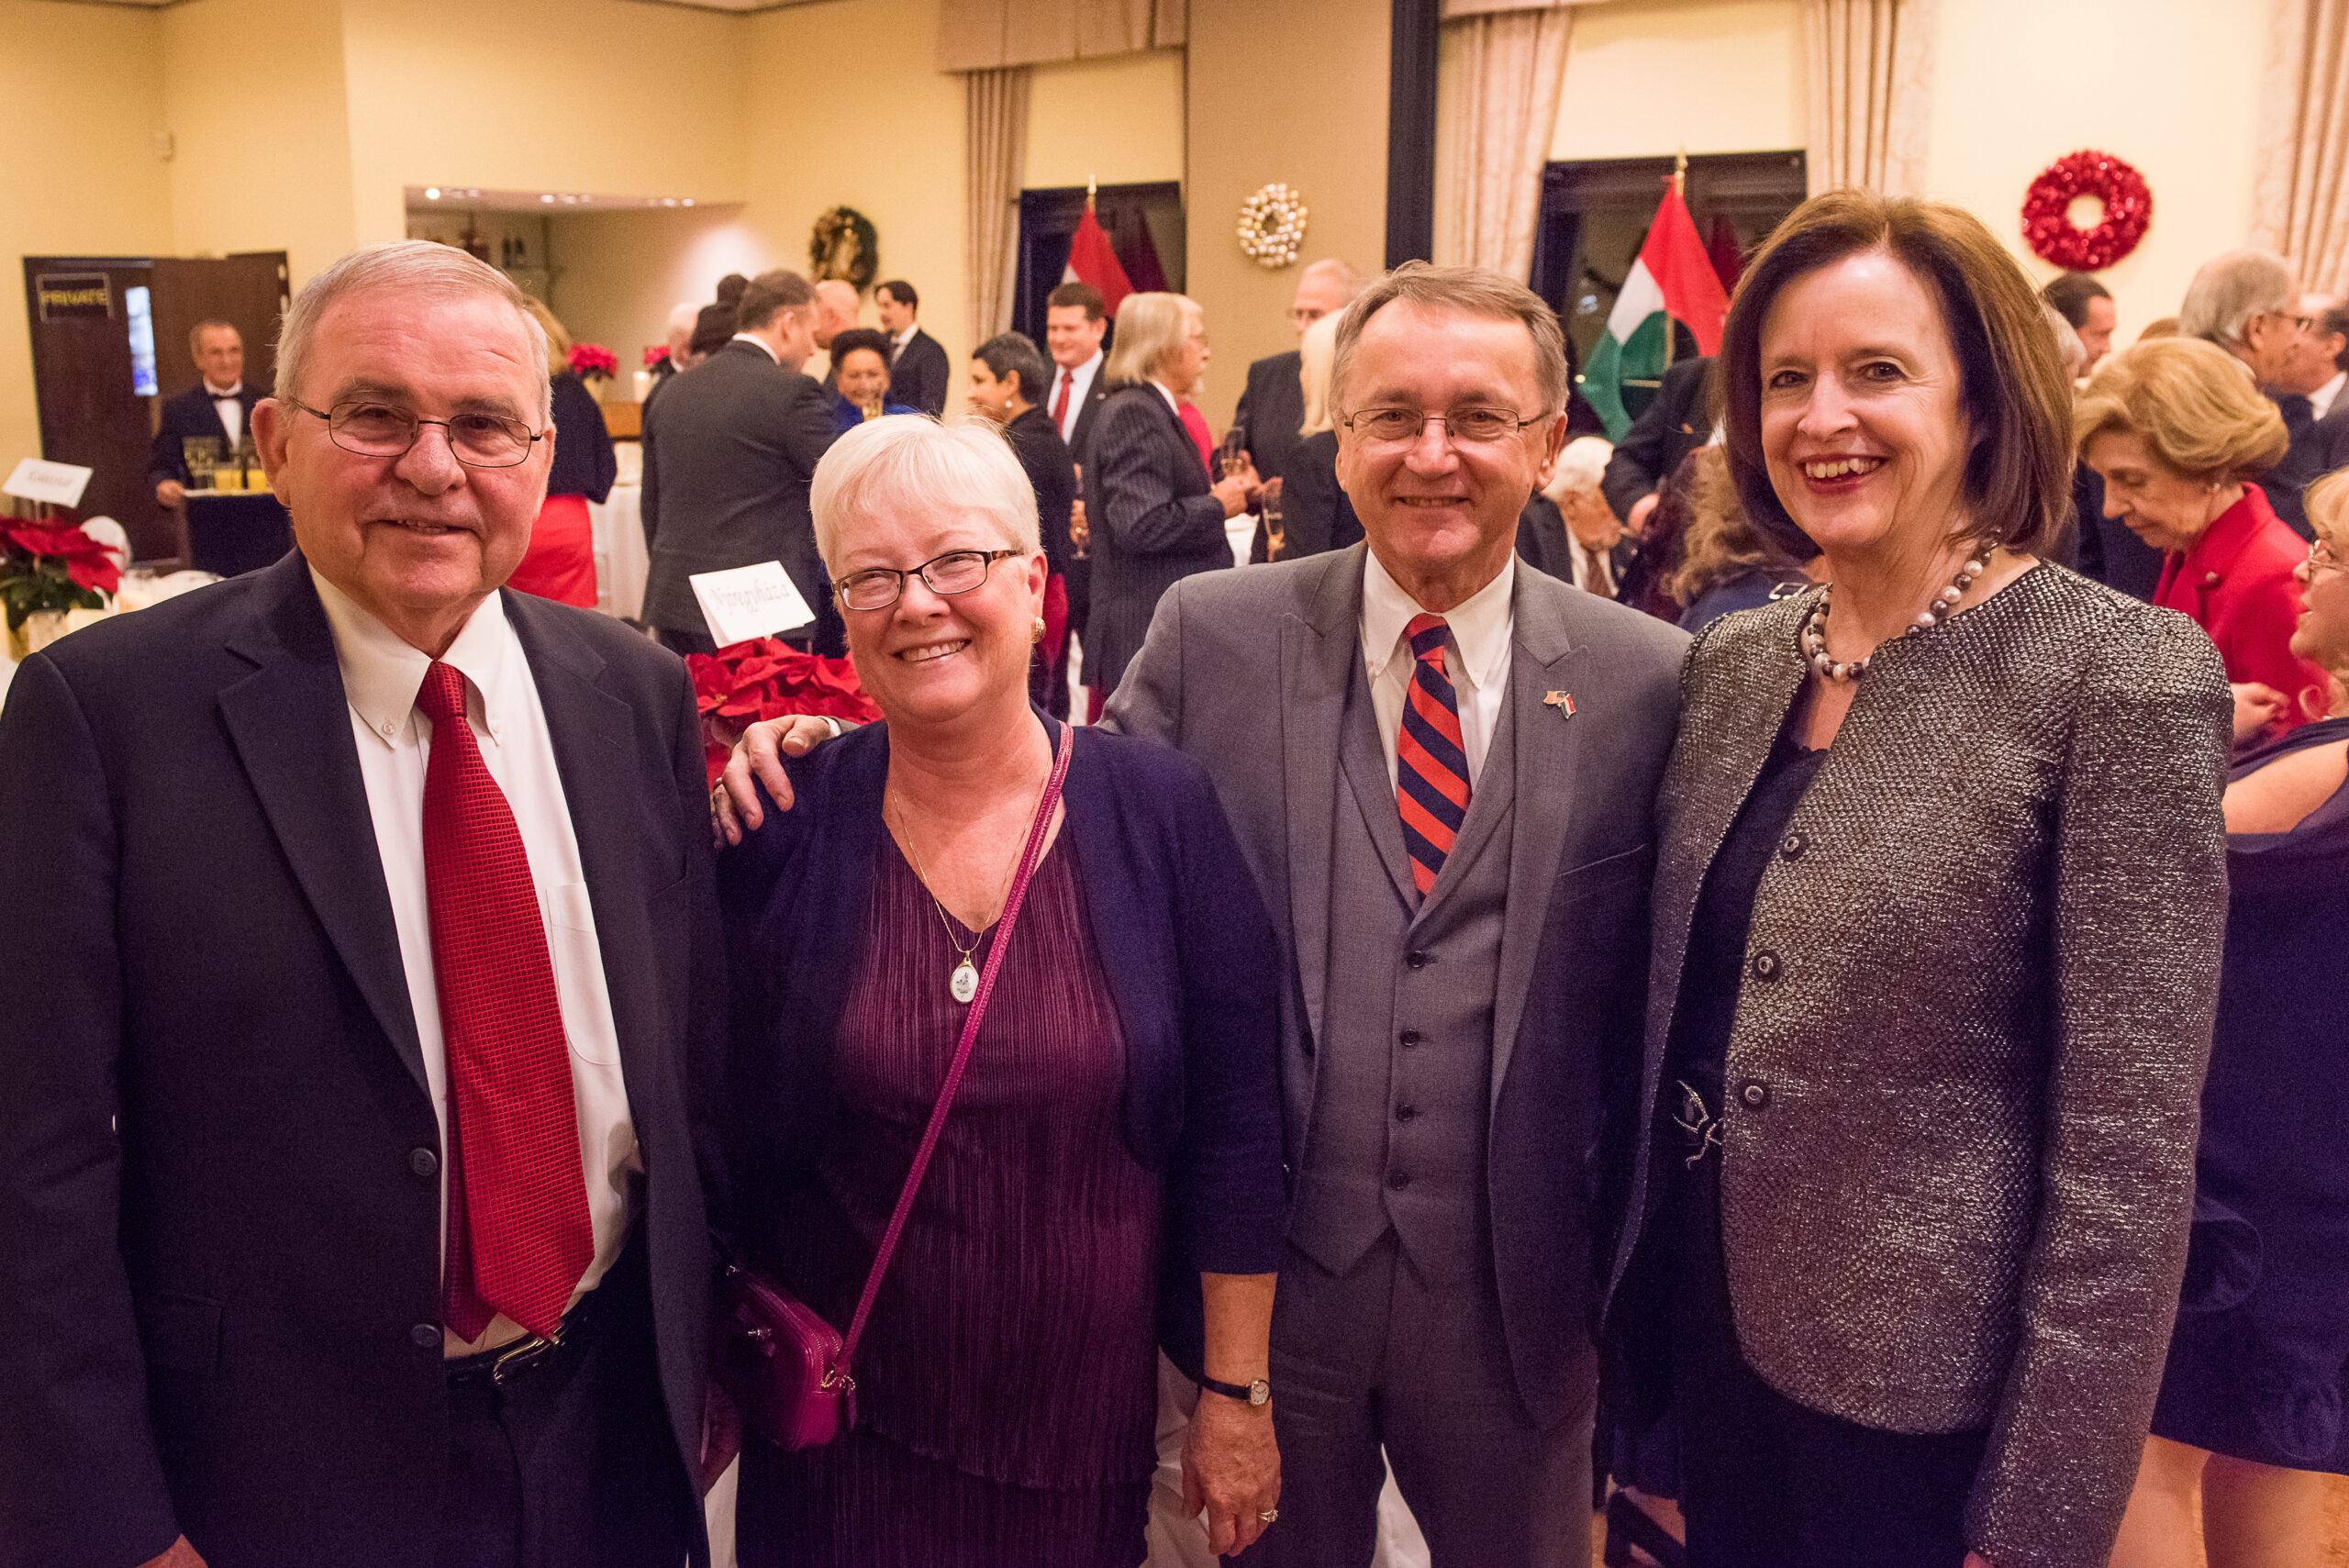 Mr. Peter Kurz, Mrs. Daphne Rozsa, Mr. Gabe Rozsa, Ambassador April H. Foley